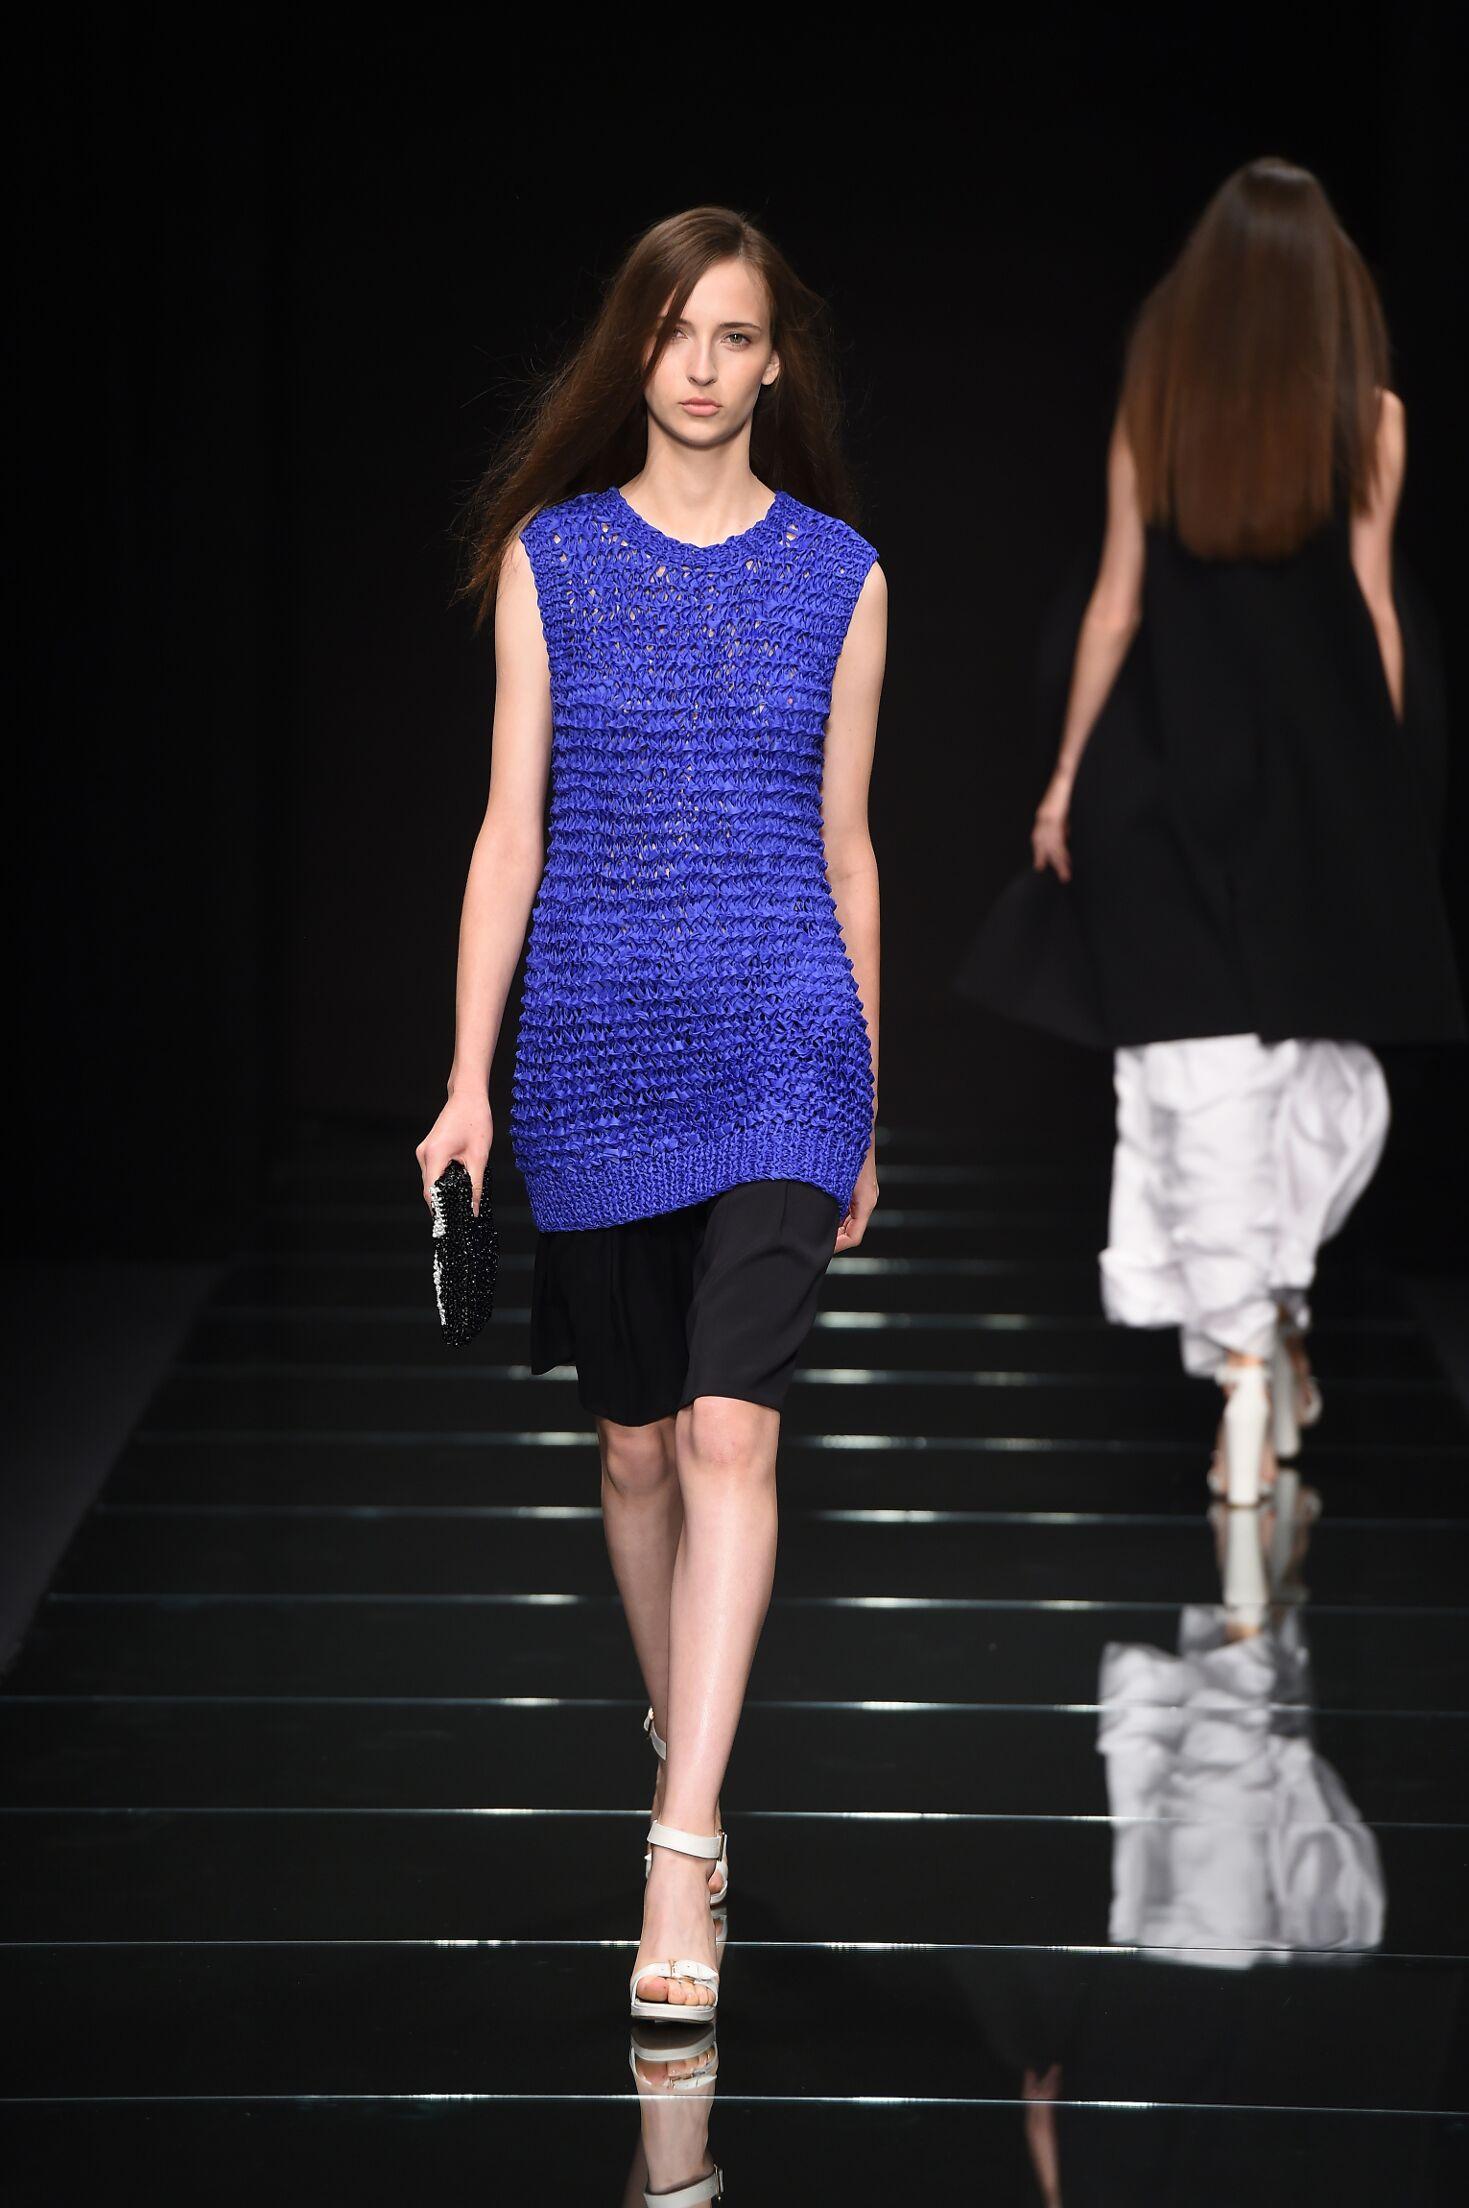 2015 Catwalk Anteprima Woman Fashion Show Summer